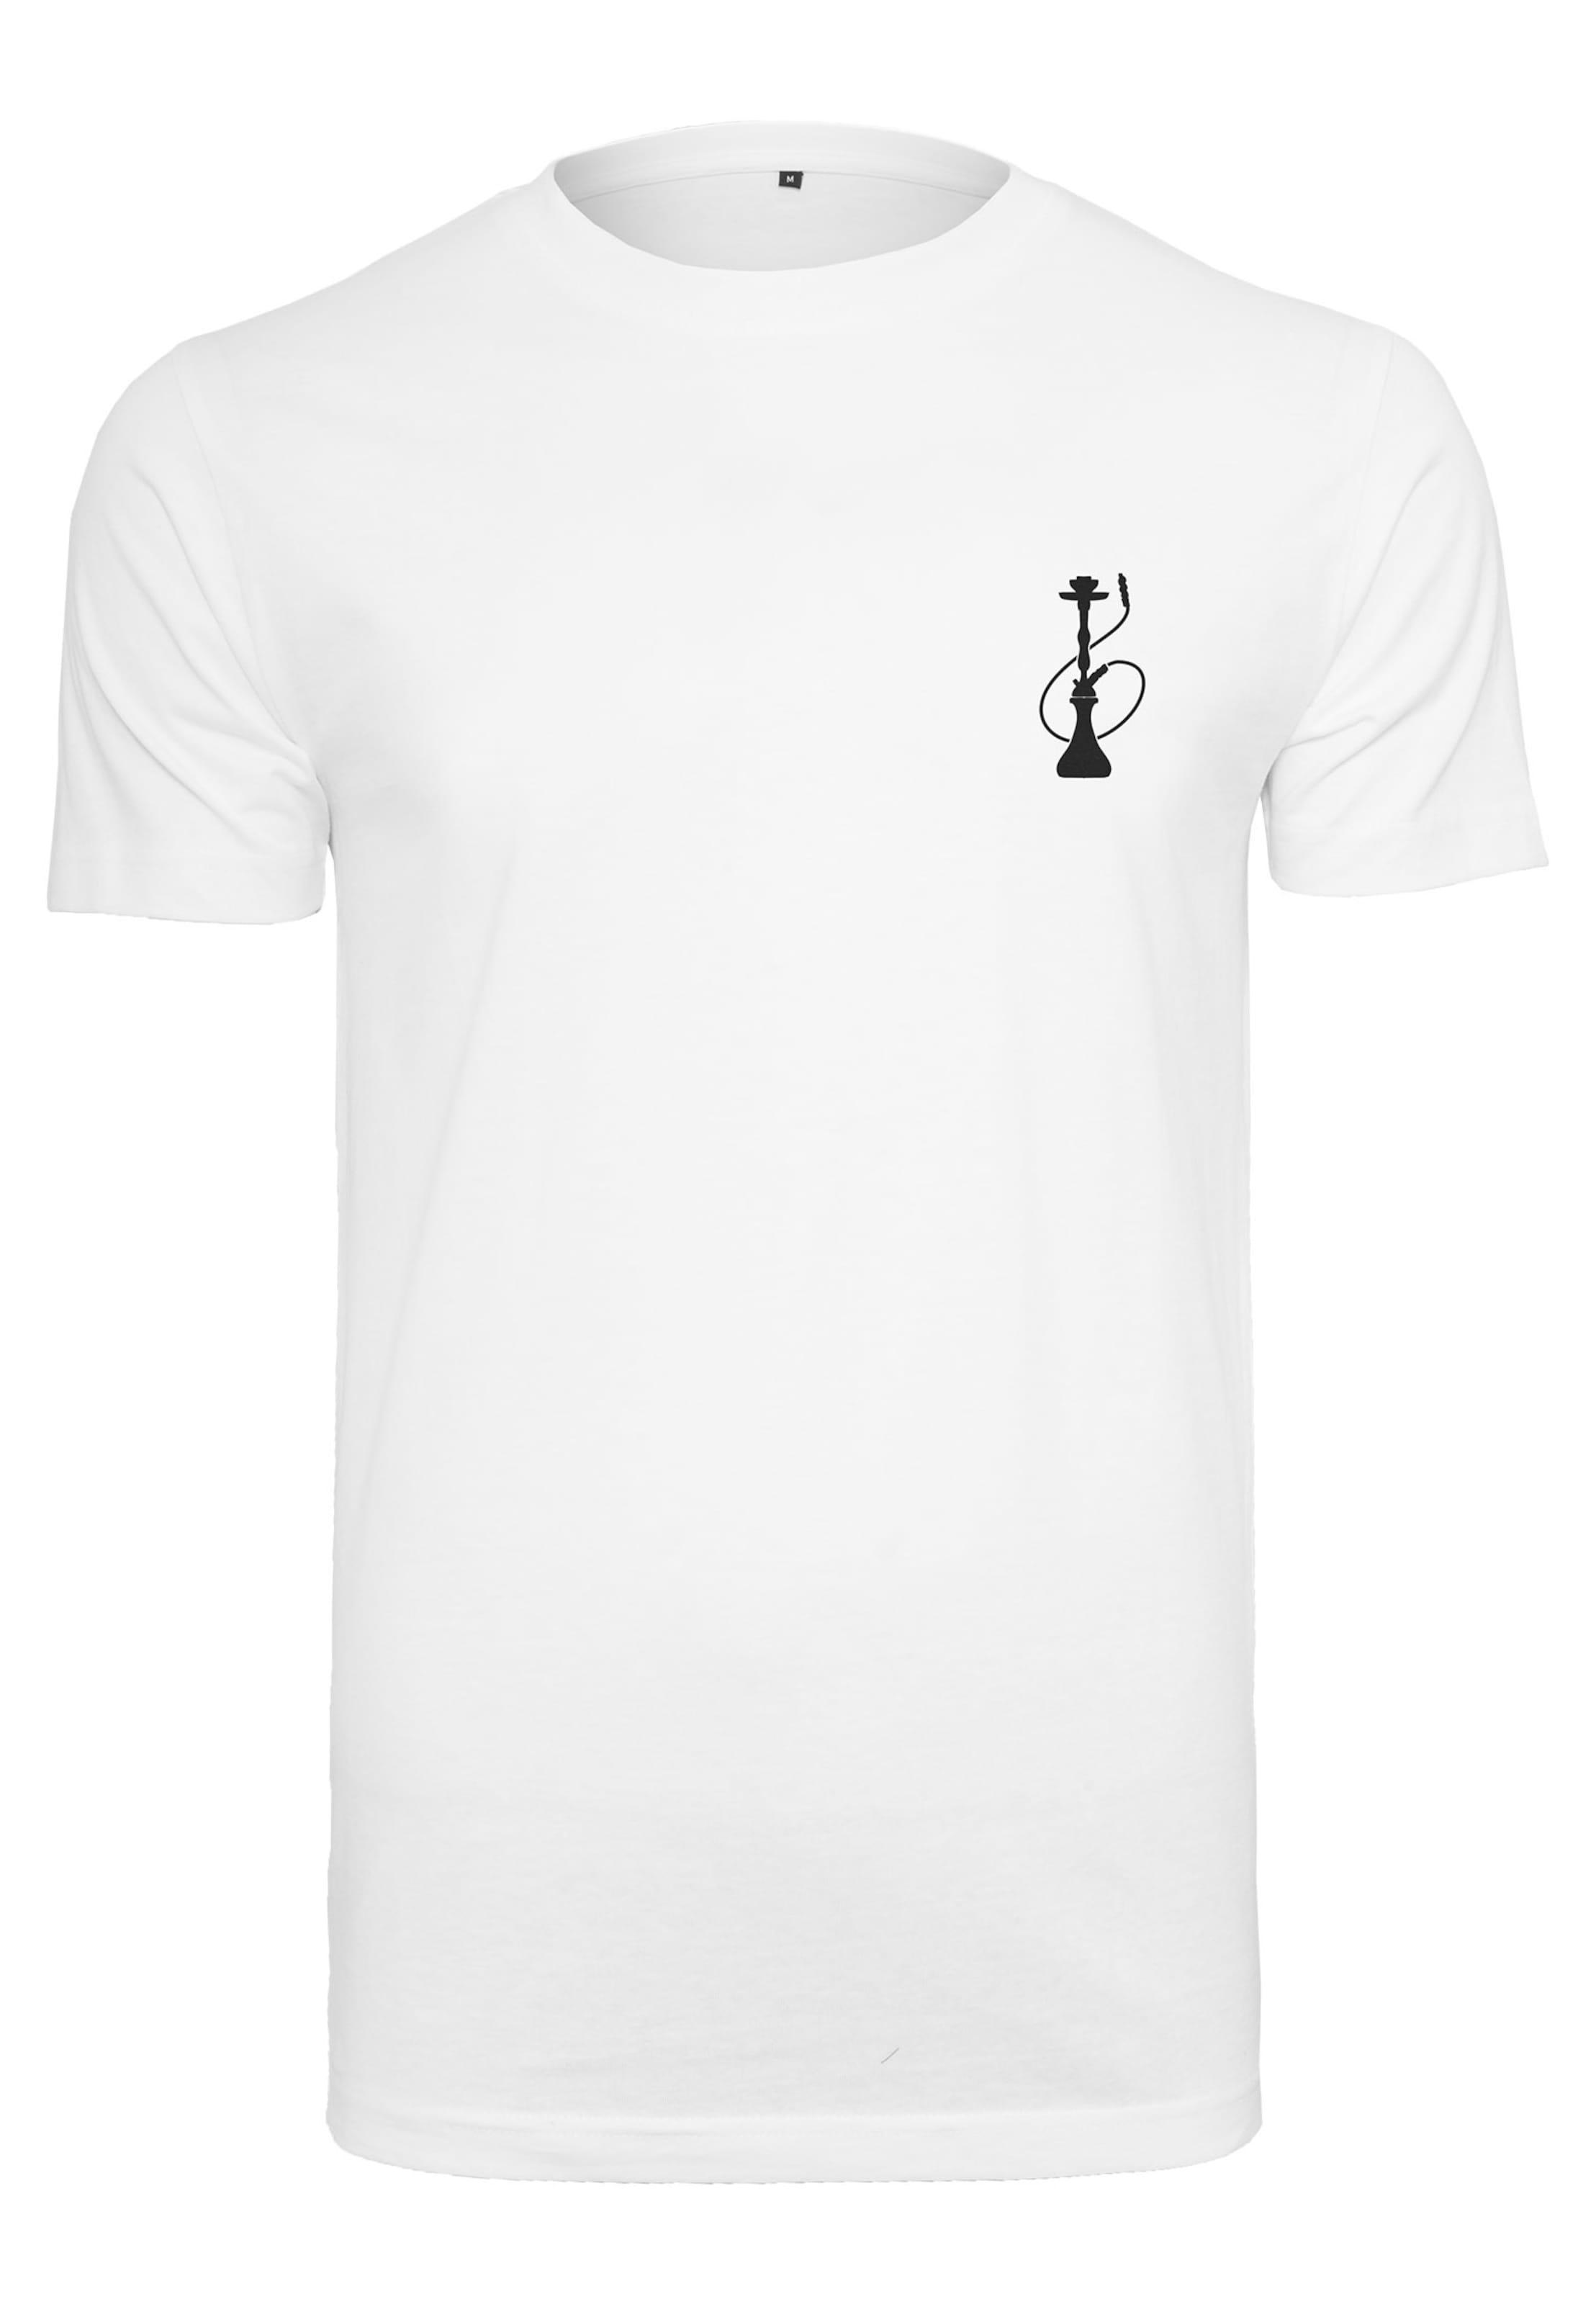 Mister SchwarzWeiß Everyday' T Tee 'hookah In shirt tsdChQr